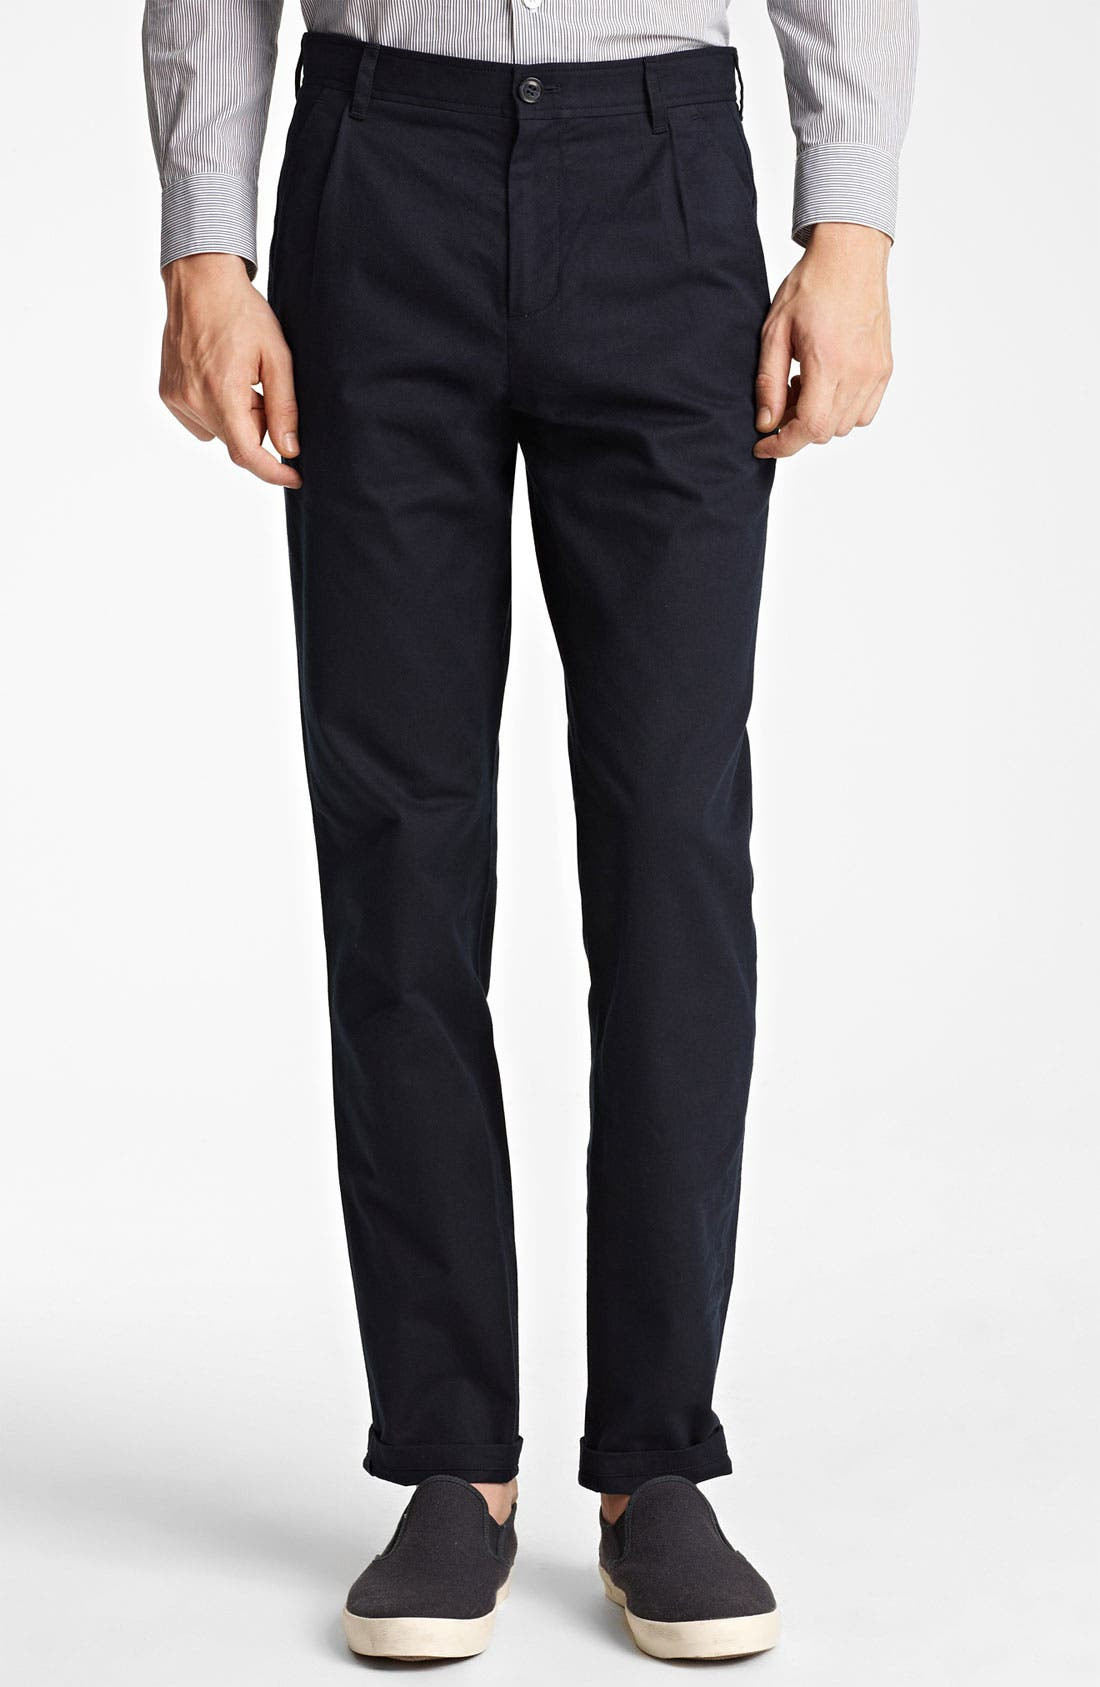 Alternate Image 1 Selected - A.P.C. Straight Leg Cotton Pants